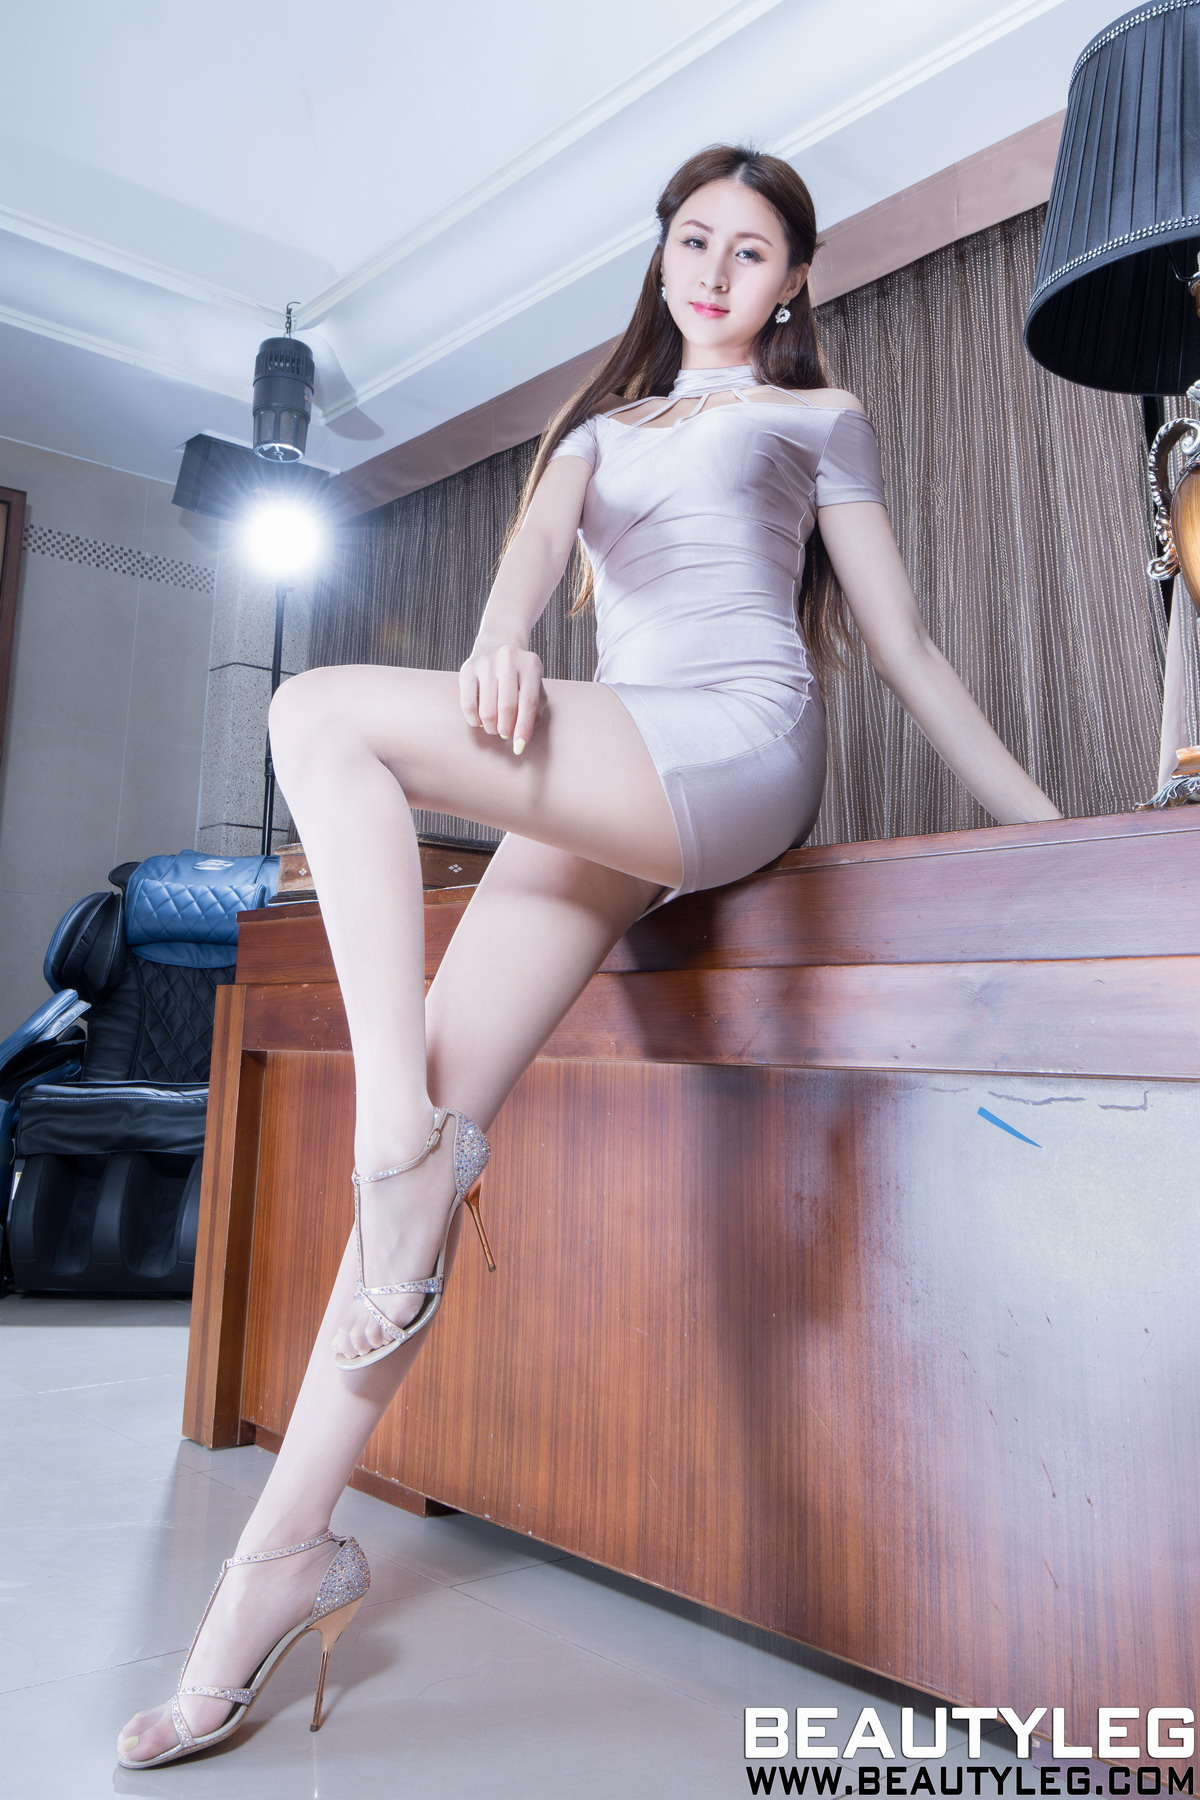 [Beautyleg]美腿写真 2020.04.22 No.1911 Lola[/468M]